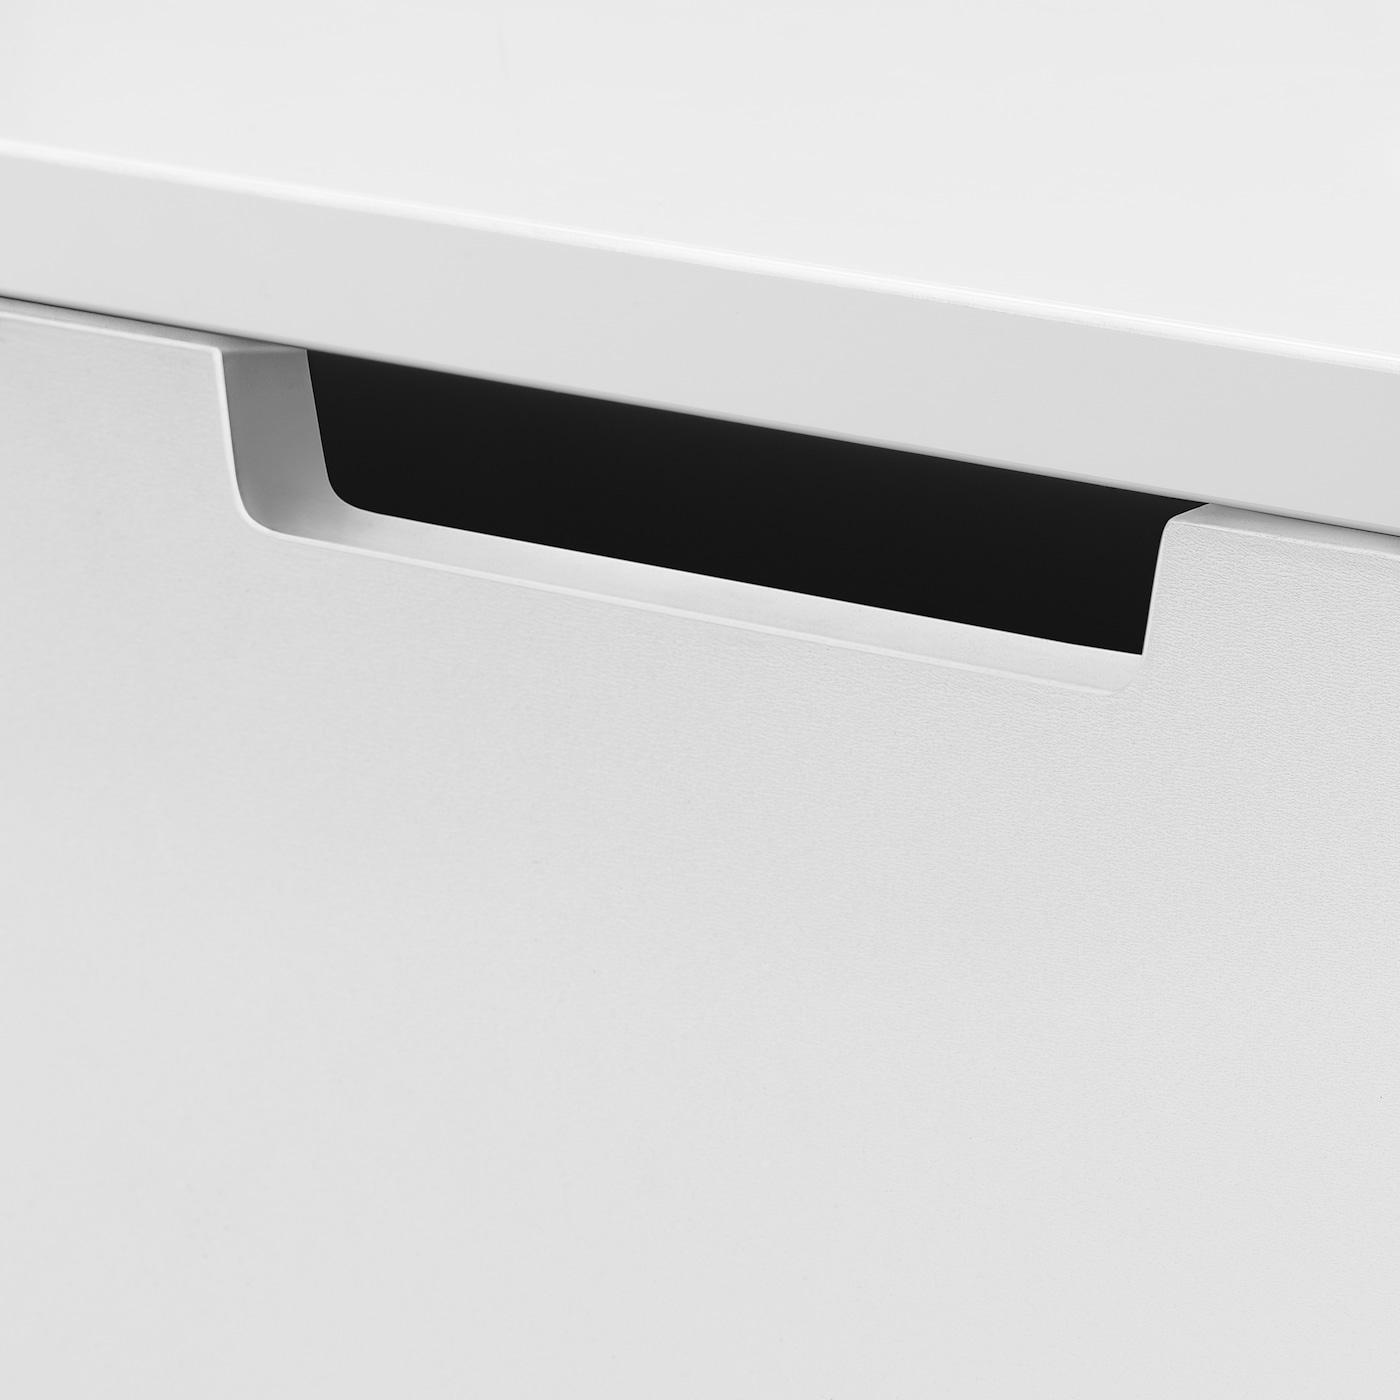 NORDLI Byrå med 2 lådor, vit, 40x54 cm IKEA